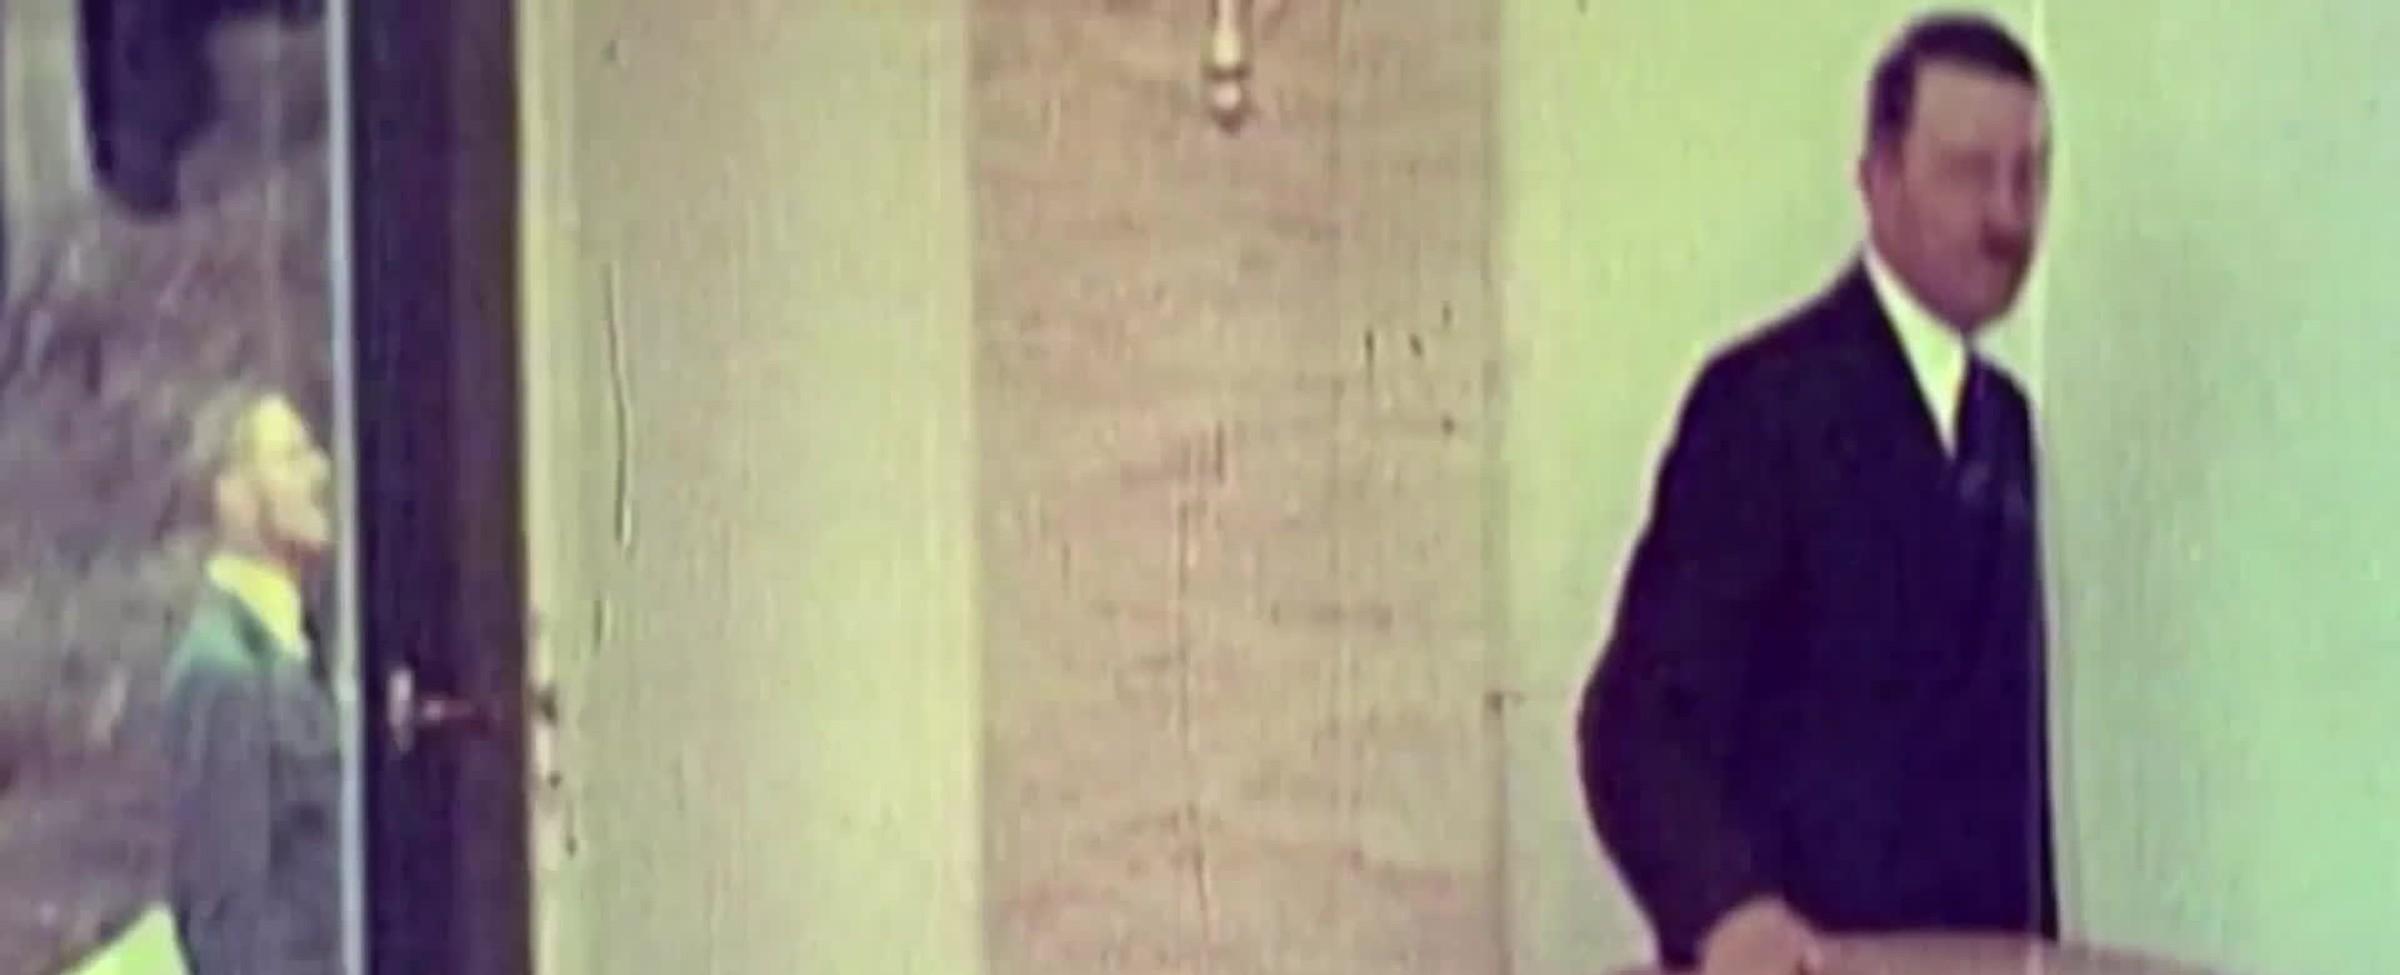 Toulavá mrtvola Adolfa Hitlera